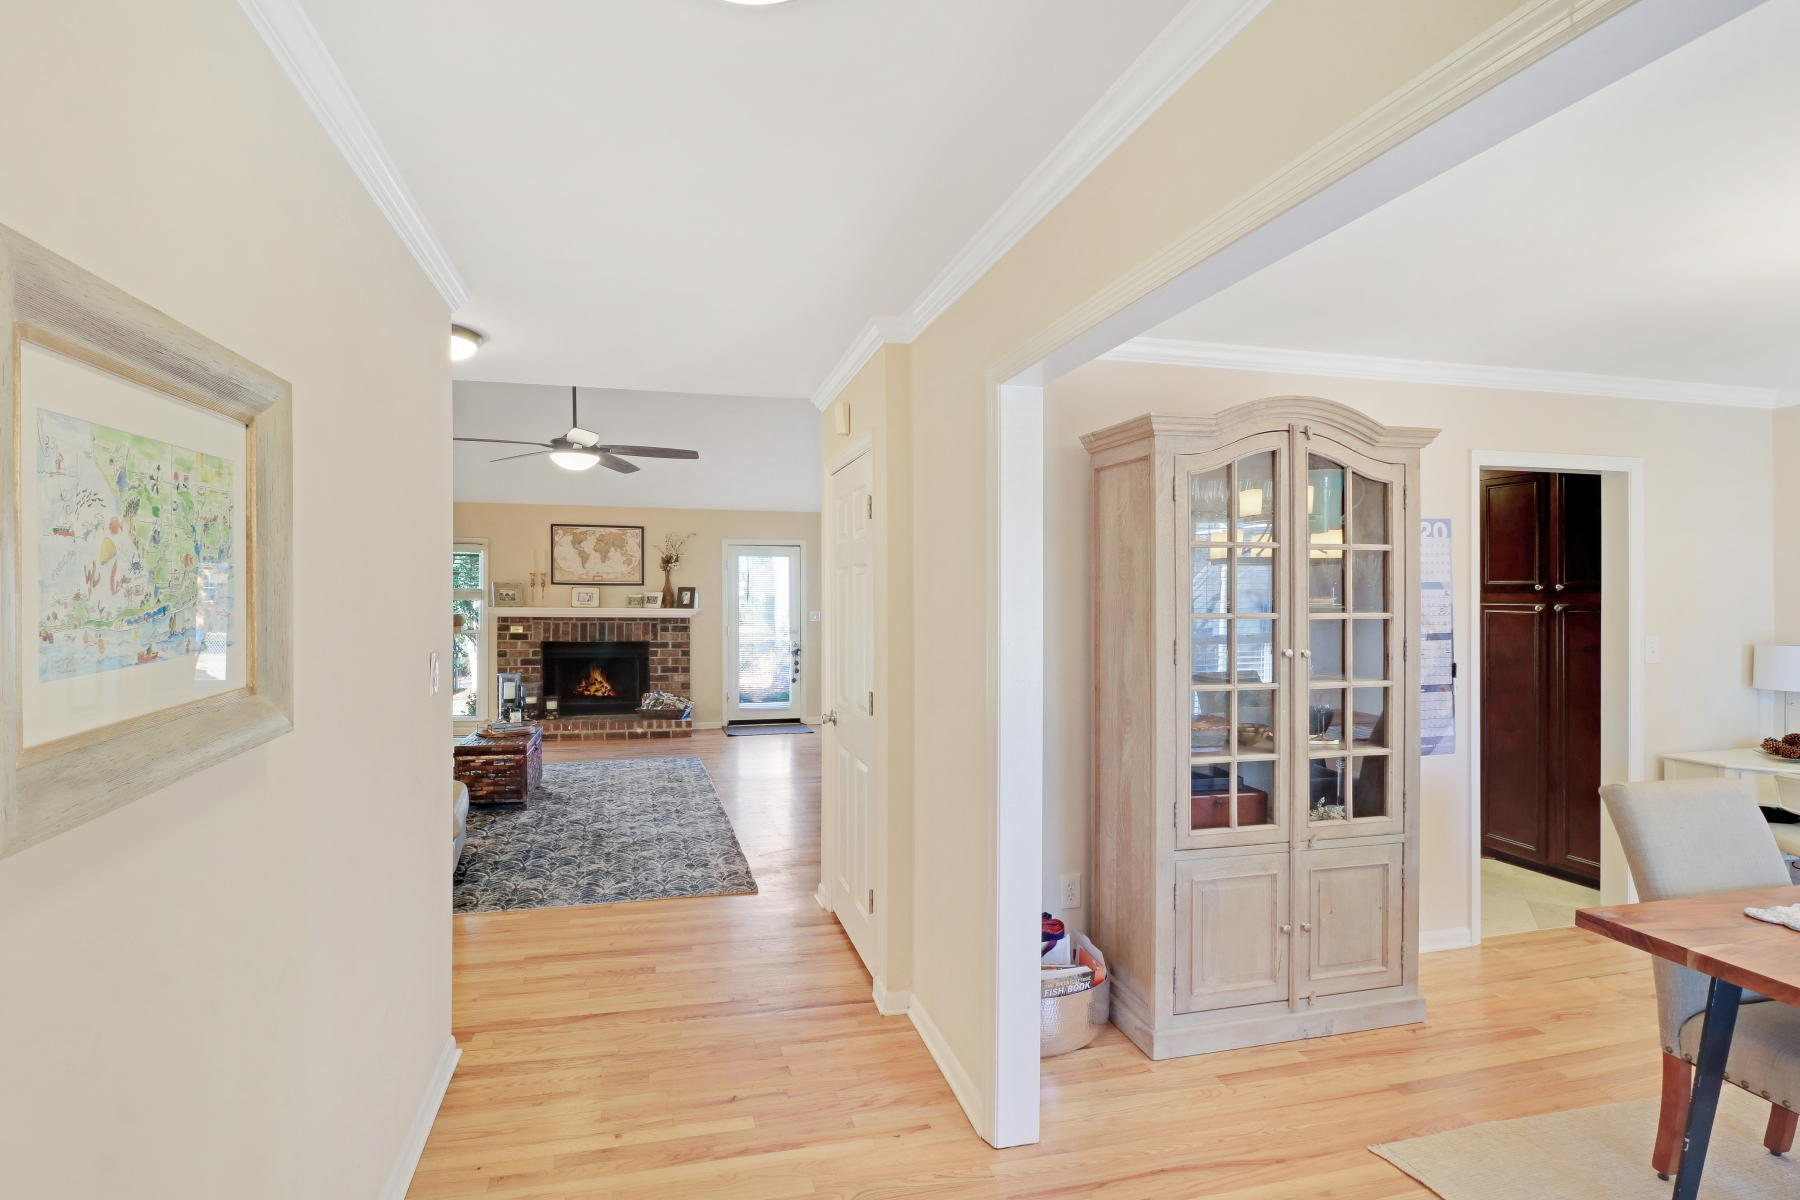 Harrison Acres Homes For Sale - 51 Markfield, Charleston, SC - 3